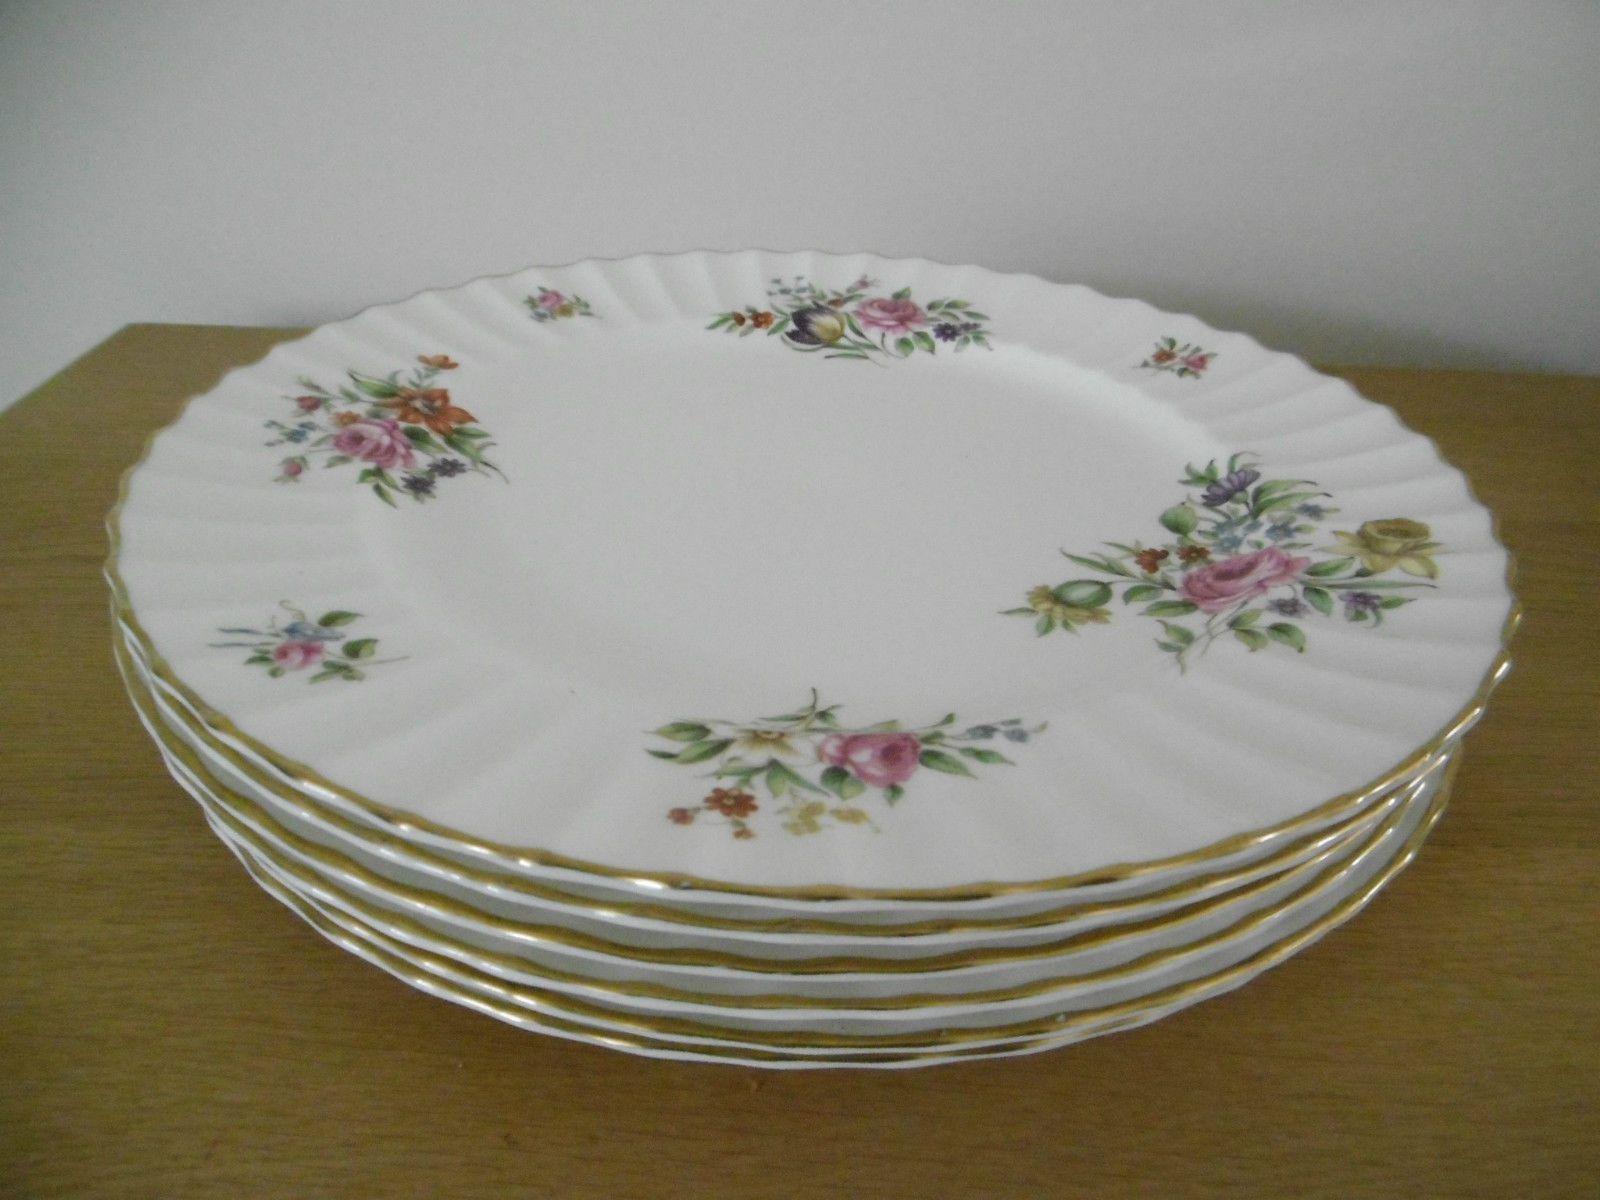 Boxed British Porcelain \u0026 China 1960-1979 Date Range   eBay. White Dinner PlatesBone ... & 6 x ROYAL WORCESTER - ROANOKE - WHITE - DINNER PLATES - Z2827 - FINE ...